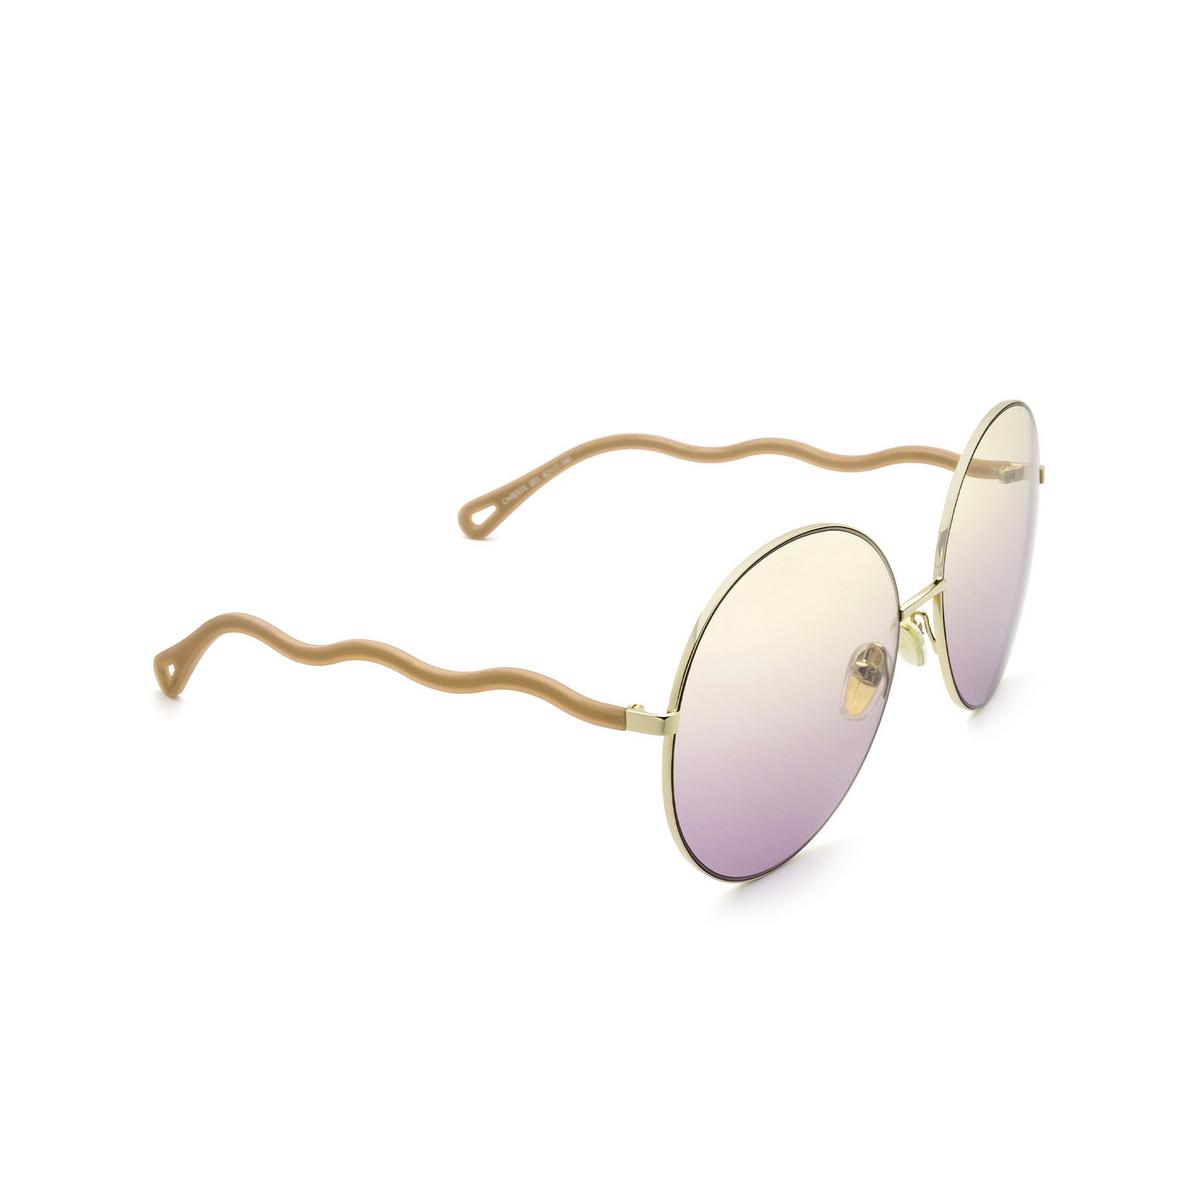 Chloé® Round Sunglasses: CH0055S color Gold 003 - three-quarters view.